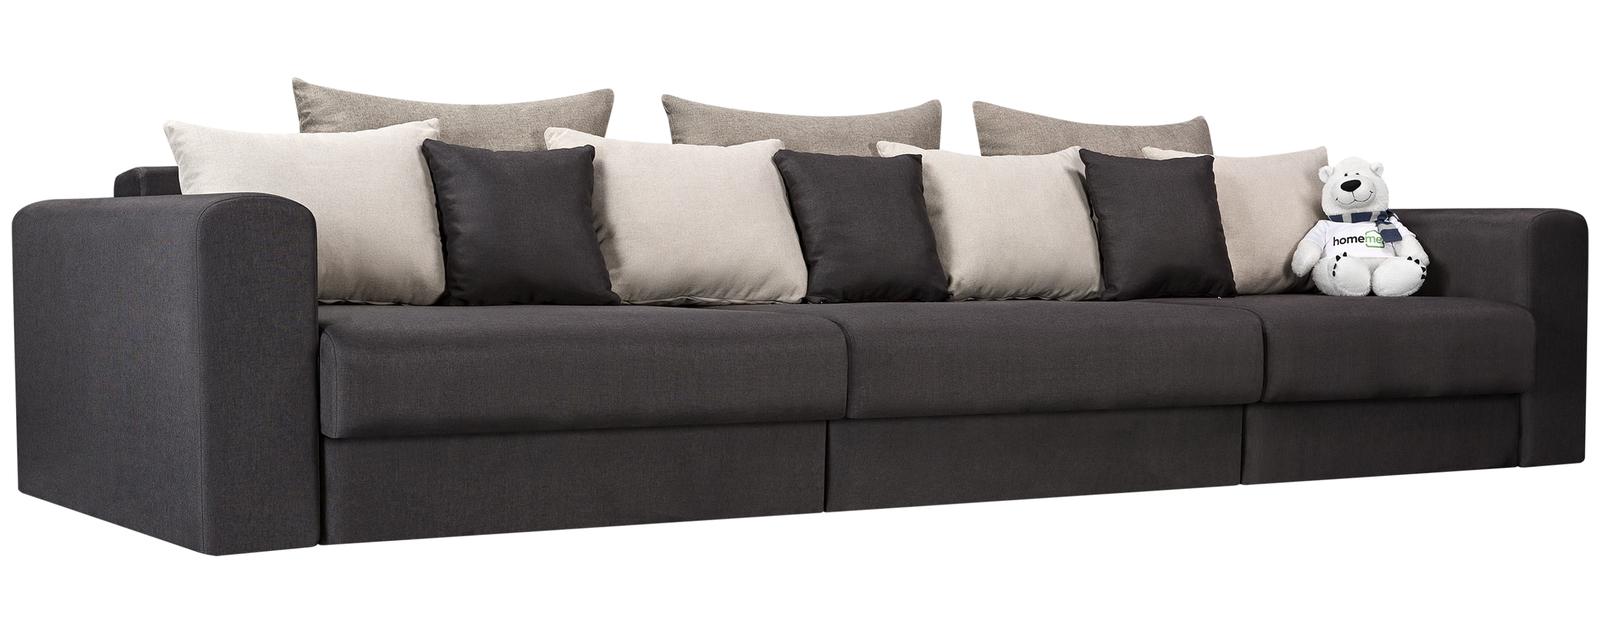 Модульный диван Медисон Вариант №1 Kiton тёмно-серый (Рогожка)